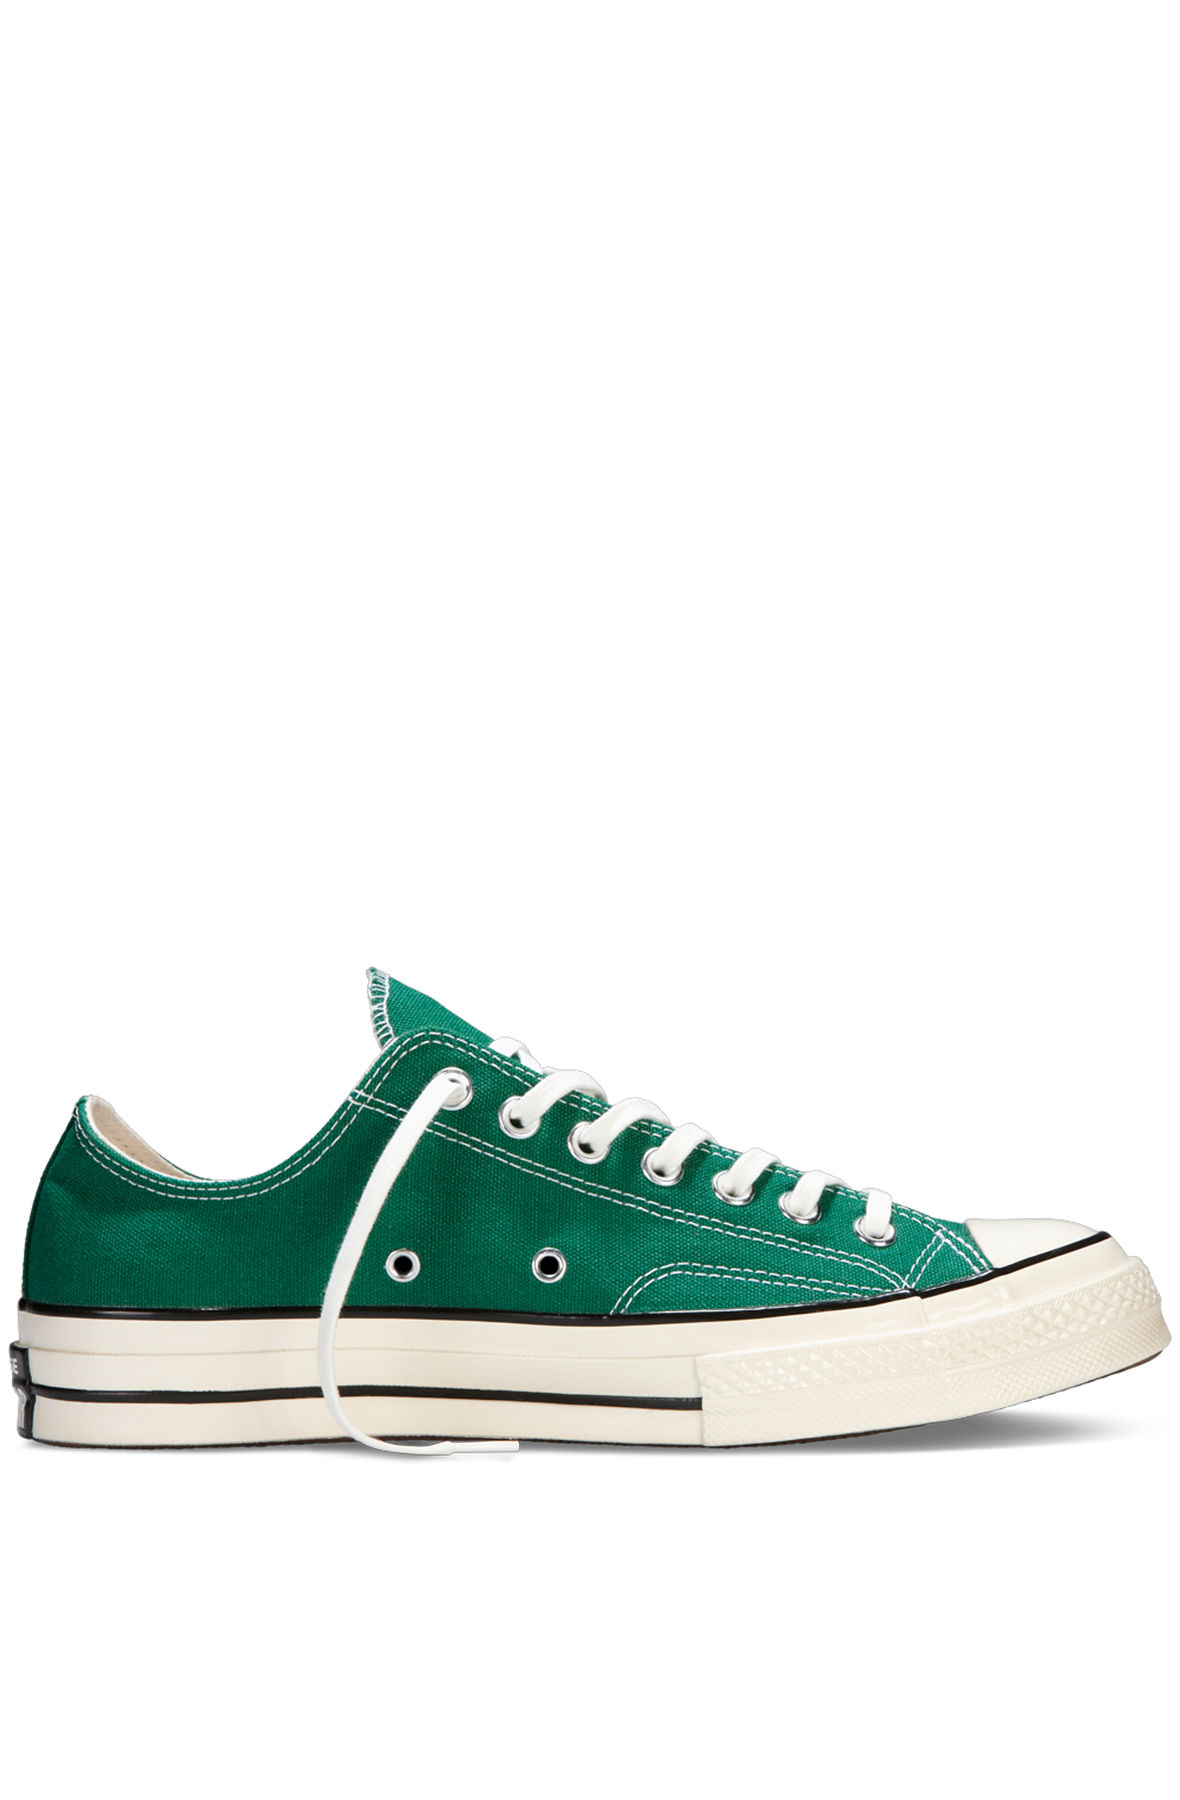 f7d9cb5dd8cc Converse Sneaker Chuck Taylor All Star 70s Ox in Amazon Green